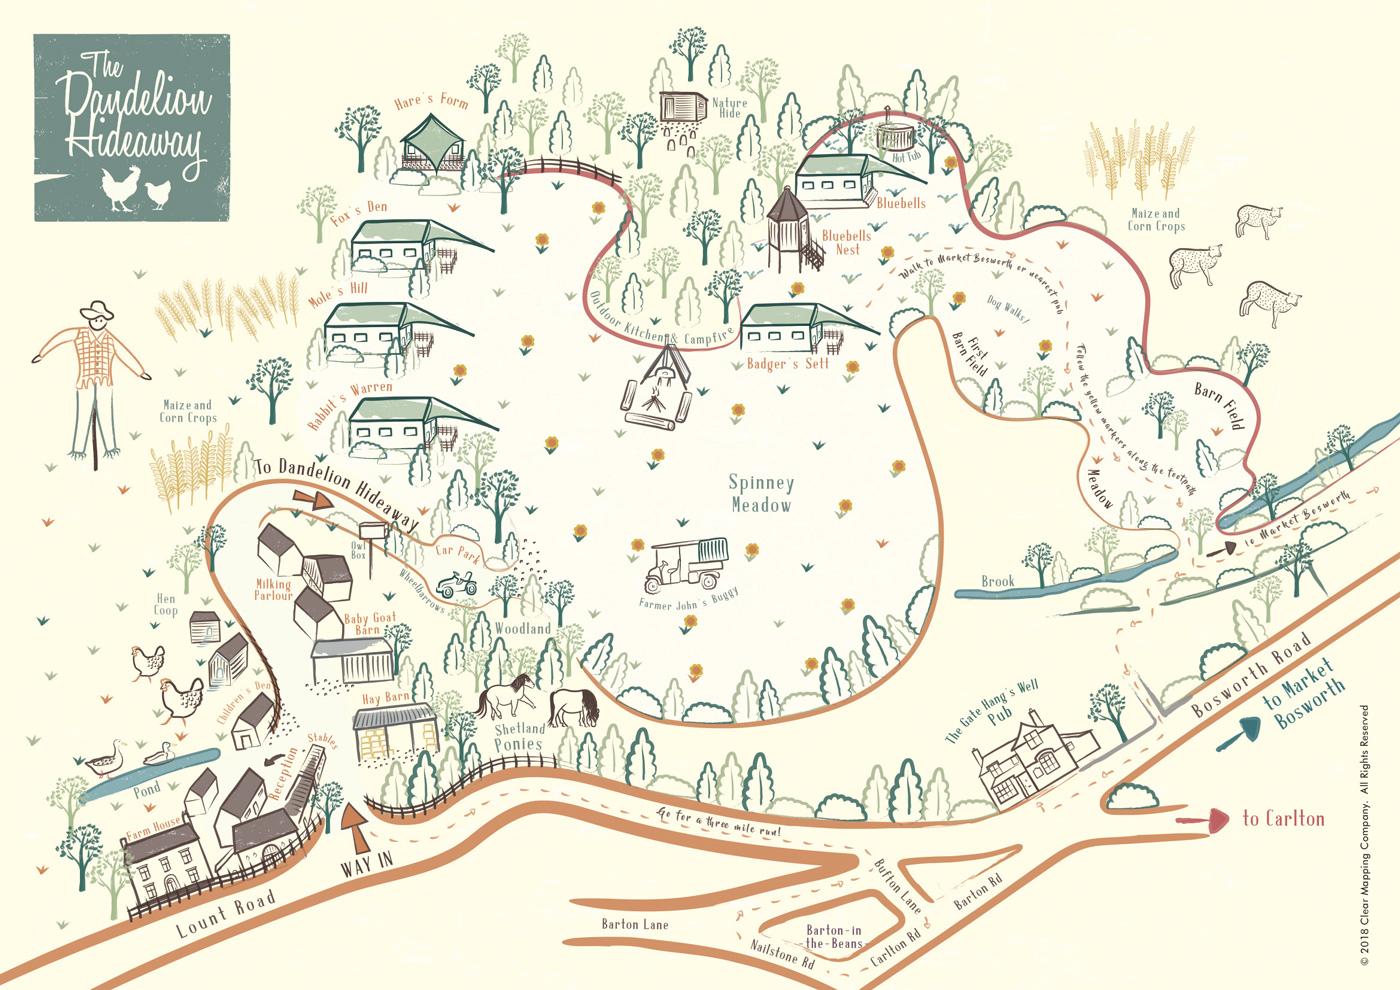 Dandelion Hideaway Illustrated Map